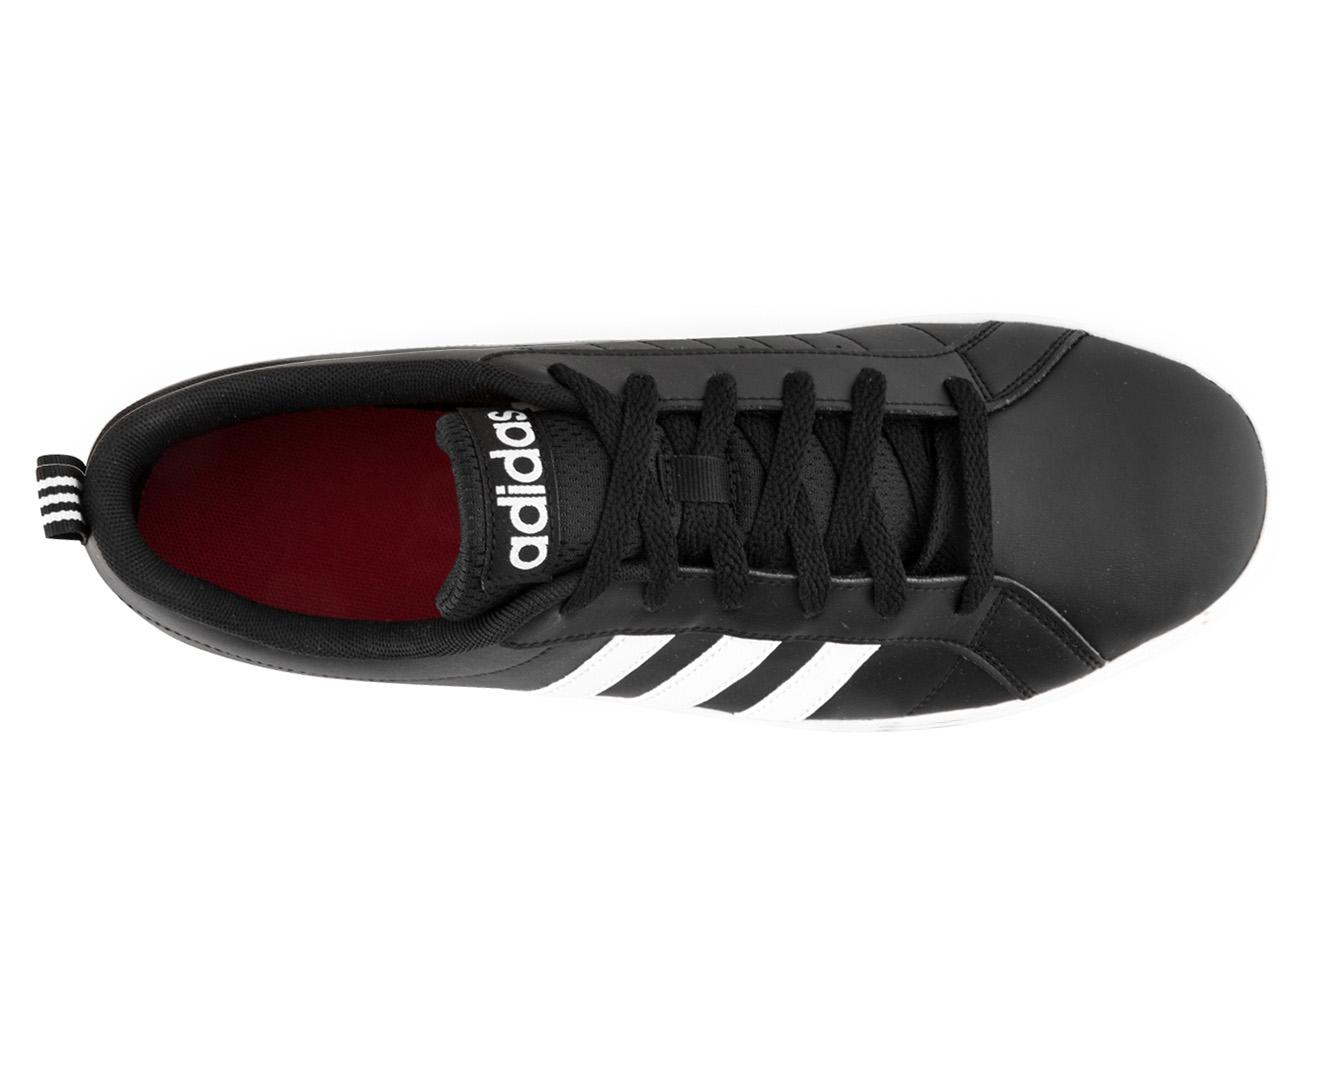 2c329b91909 Adidas NEO Men s VS Pace Leather Shoe - Black White Scarlet